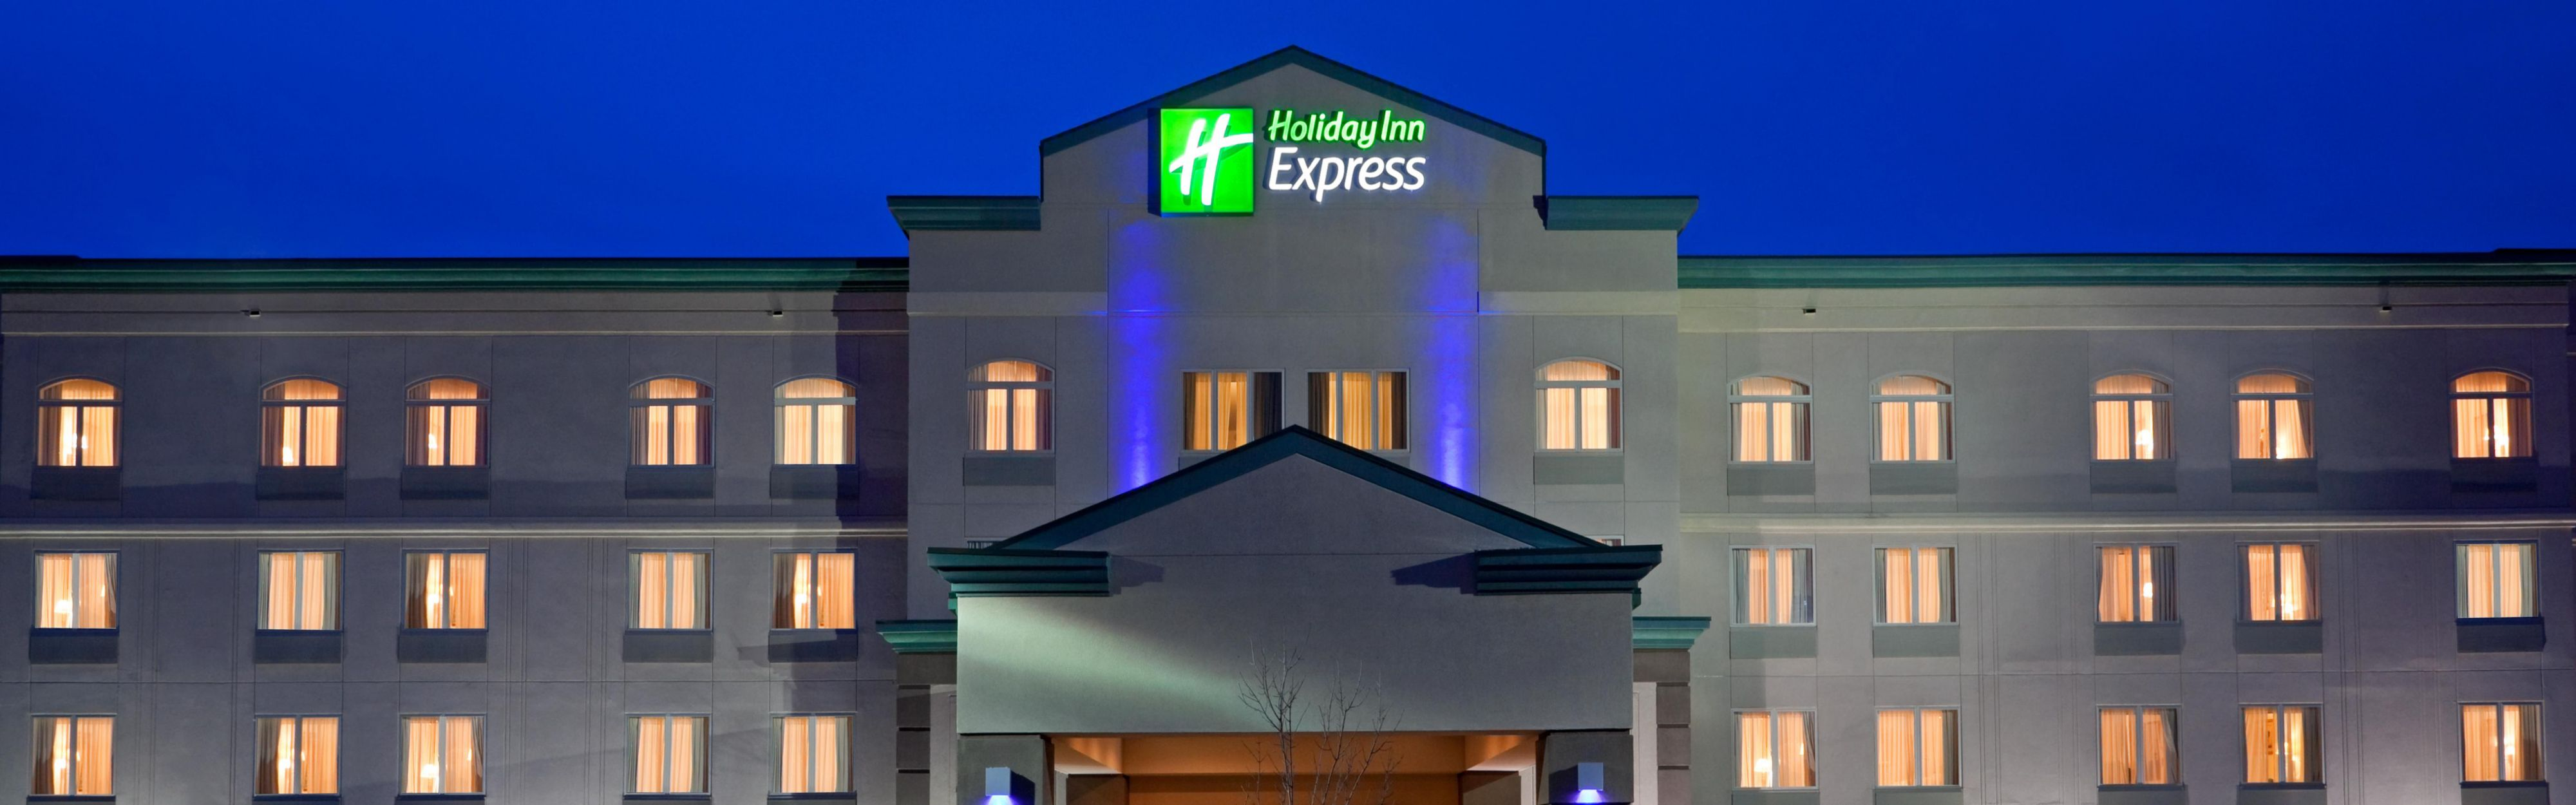 Holiday Inn Express Syracuse-Fairgrounds image 0